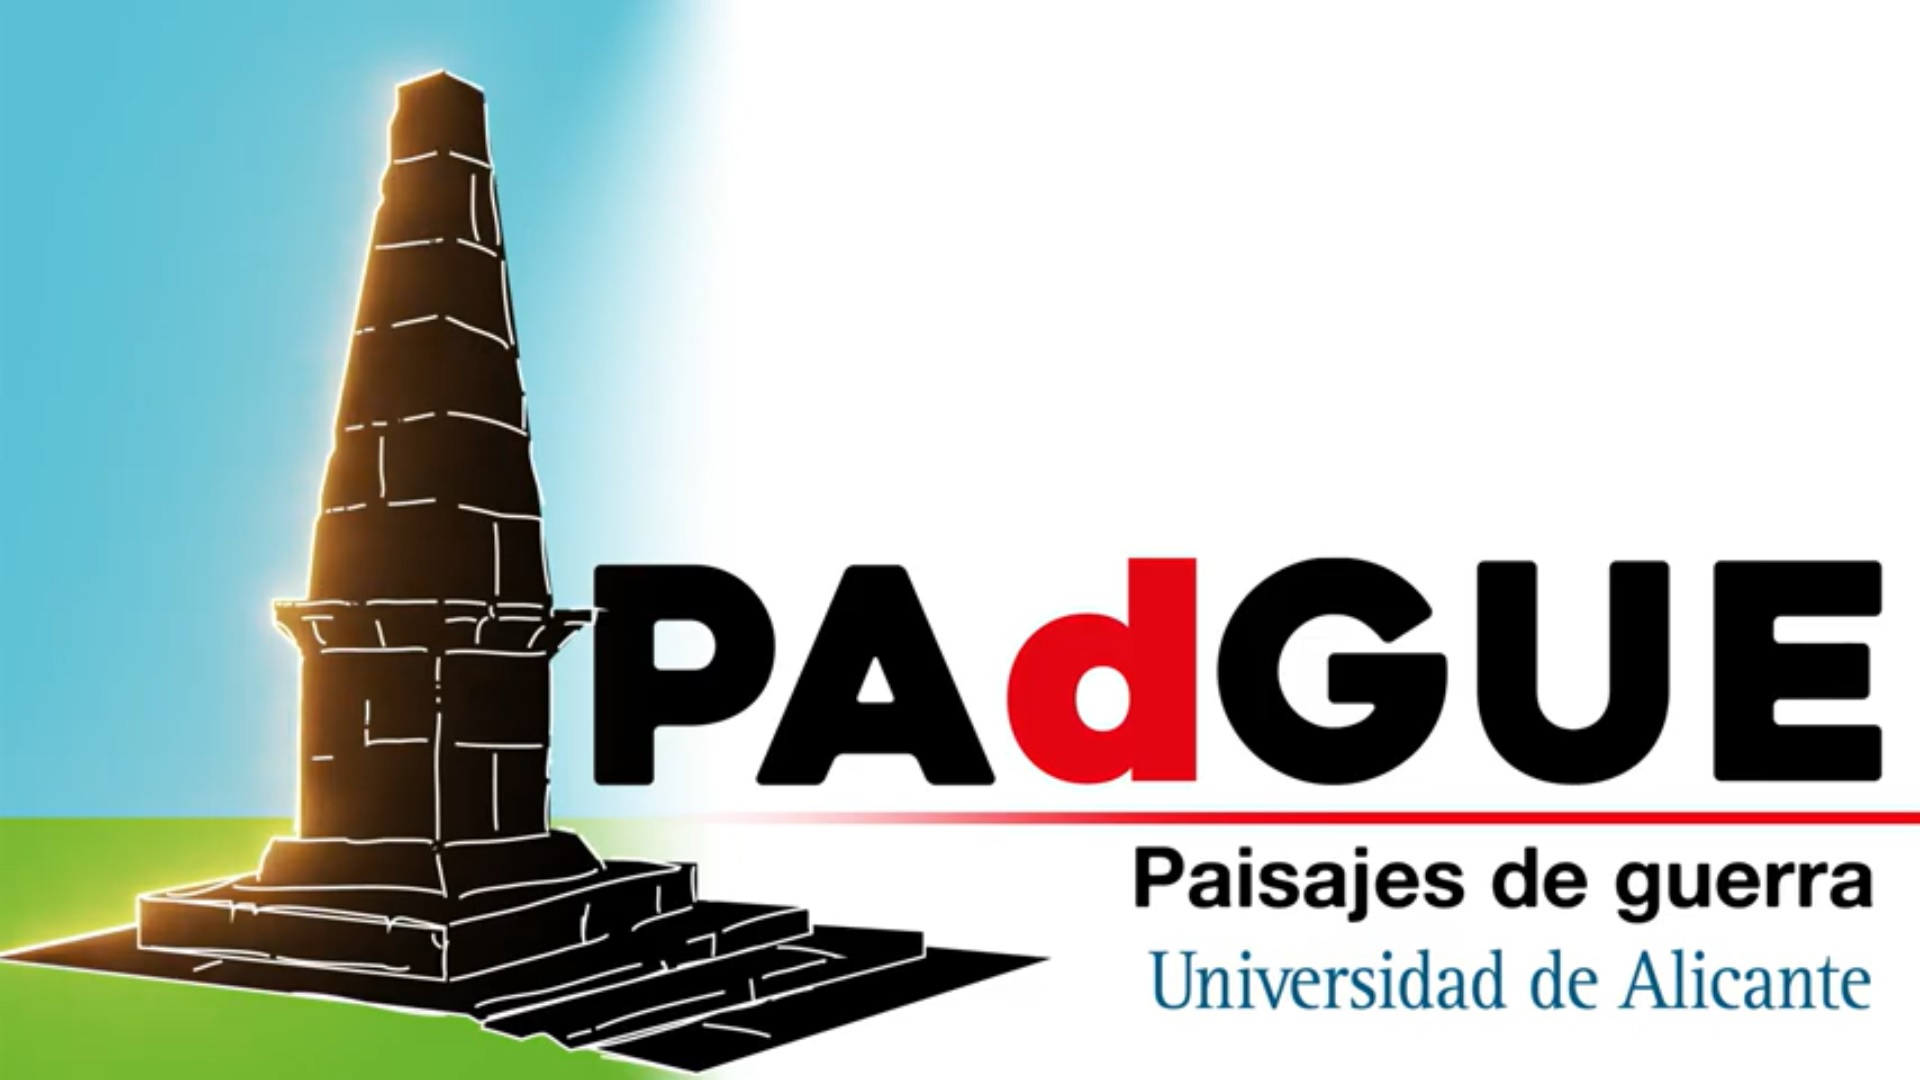 http://ahmaix.es/wp-content/uploads/2021/08/PAdGUElogo.jpg